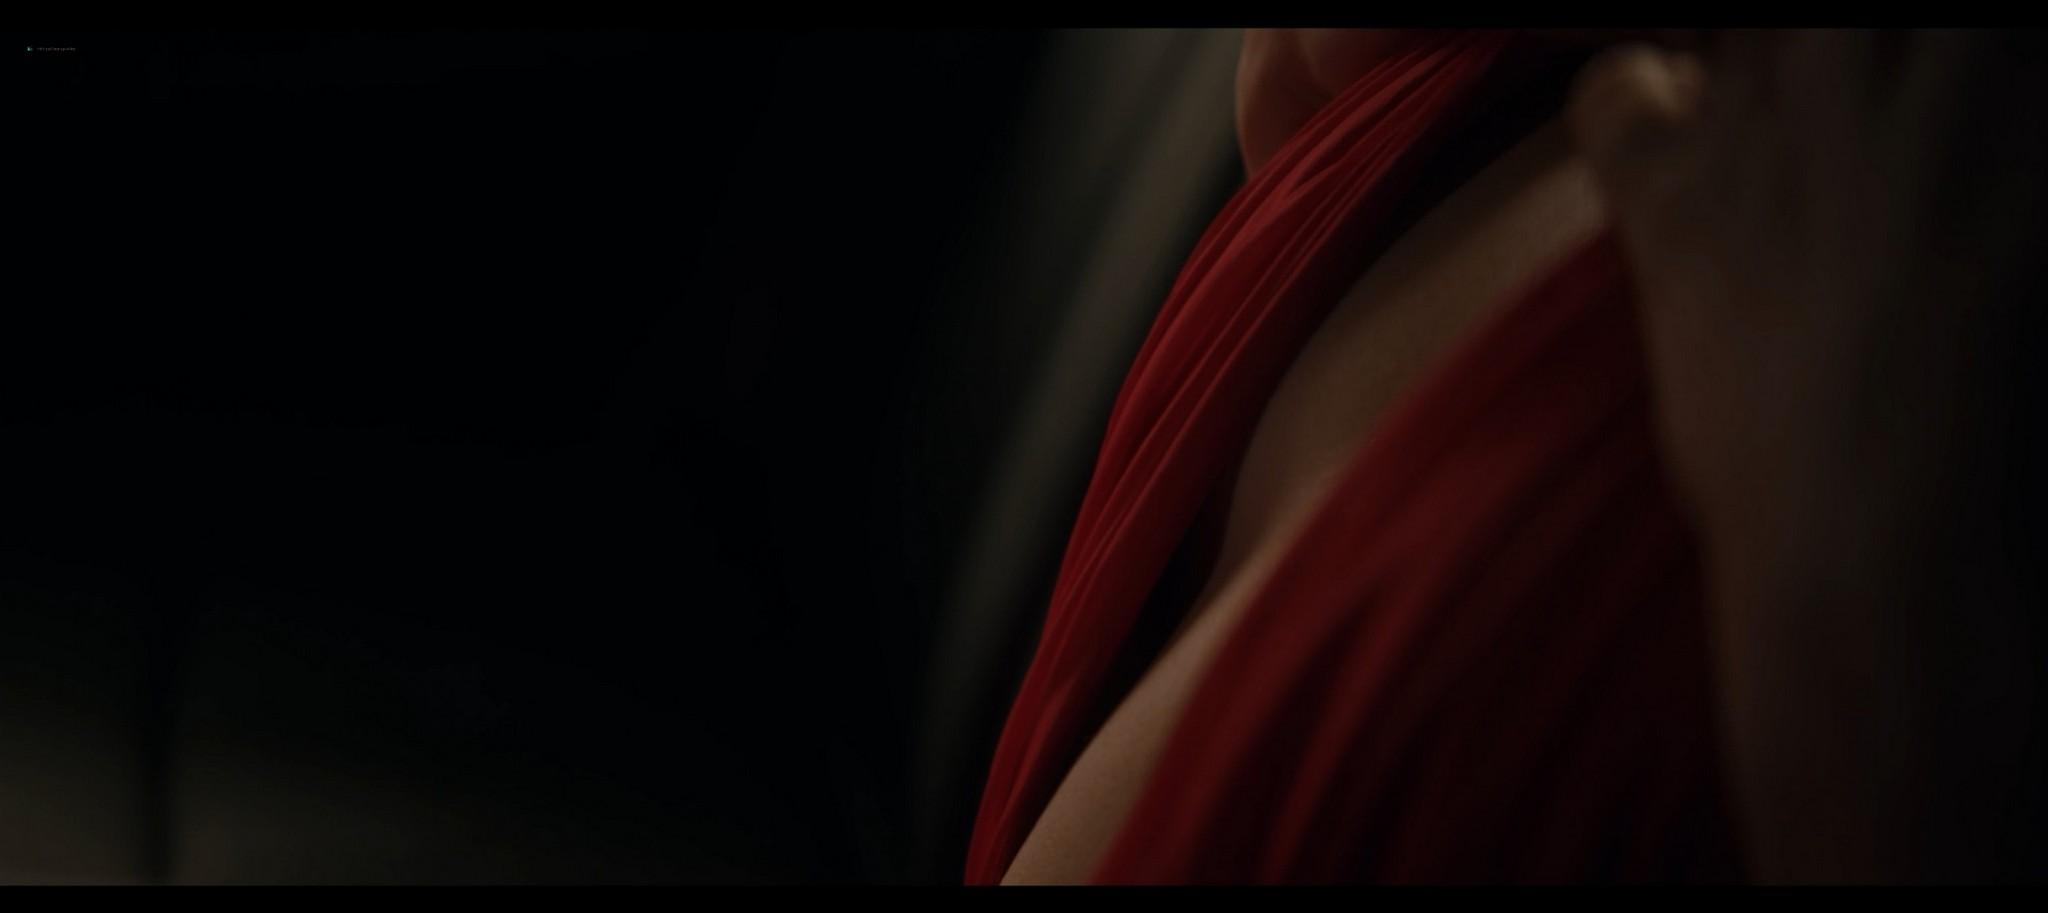 Ana de Armas hot and sexy Entering Red 2019 1080p Web 11